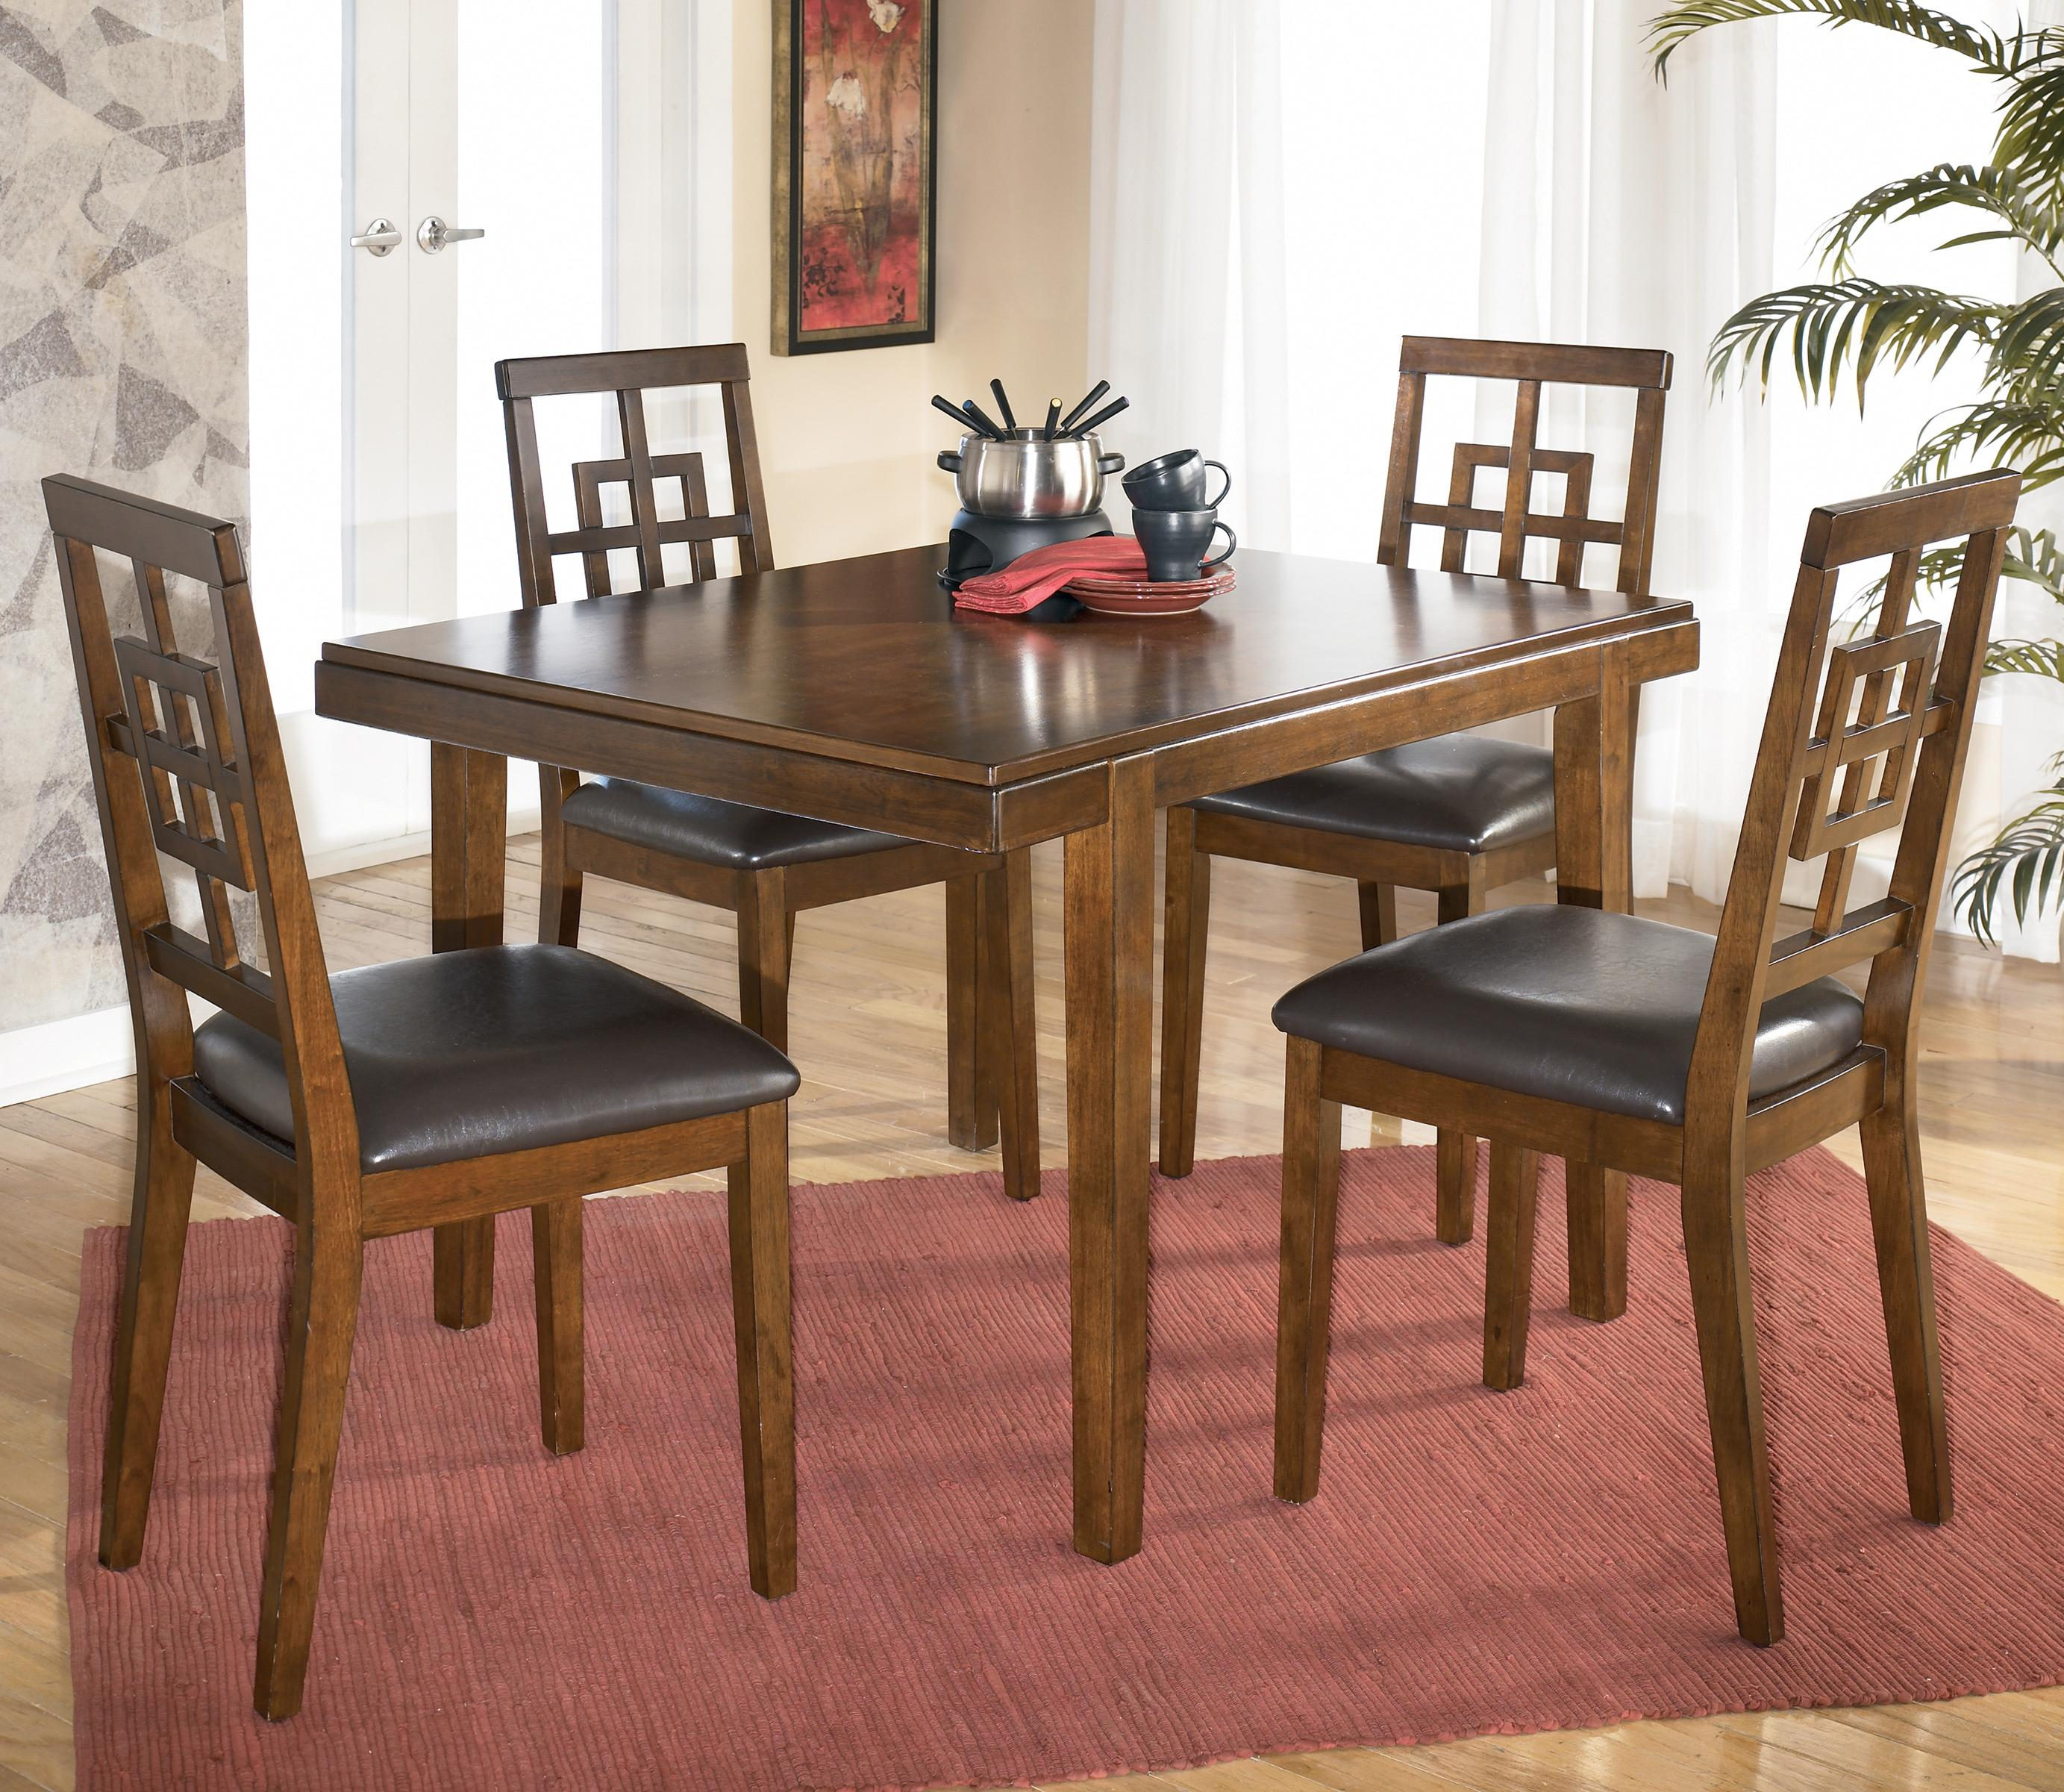 Cimeran 5-Piece Dining Set by Signature Design by Ashley at HomeWorld Furniture